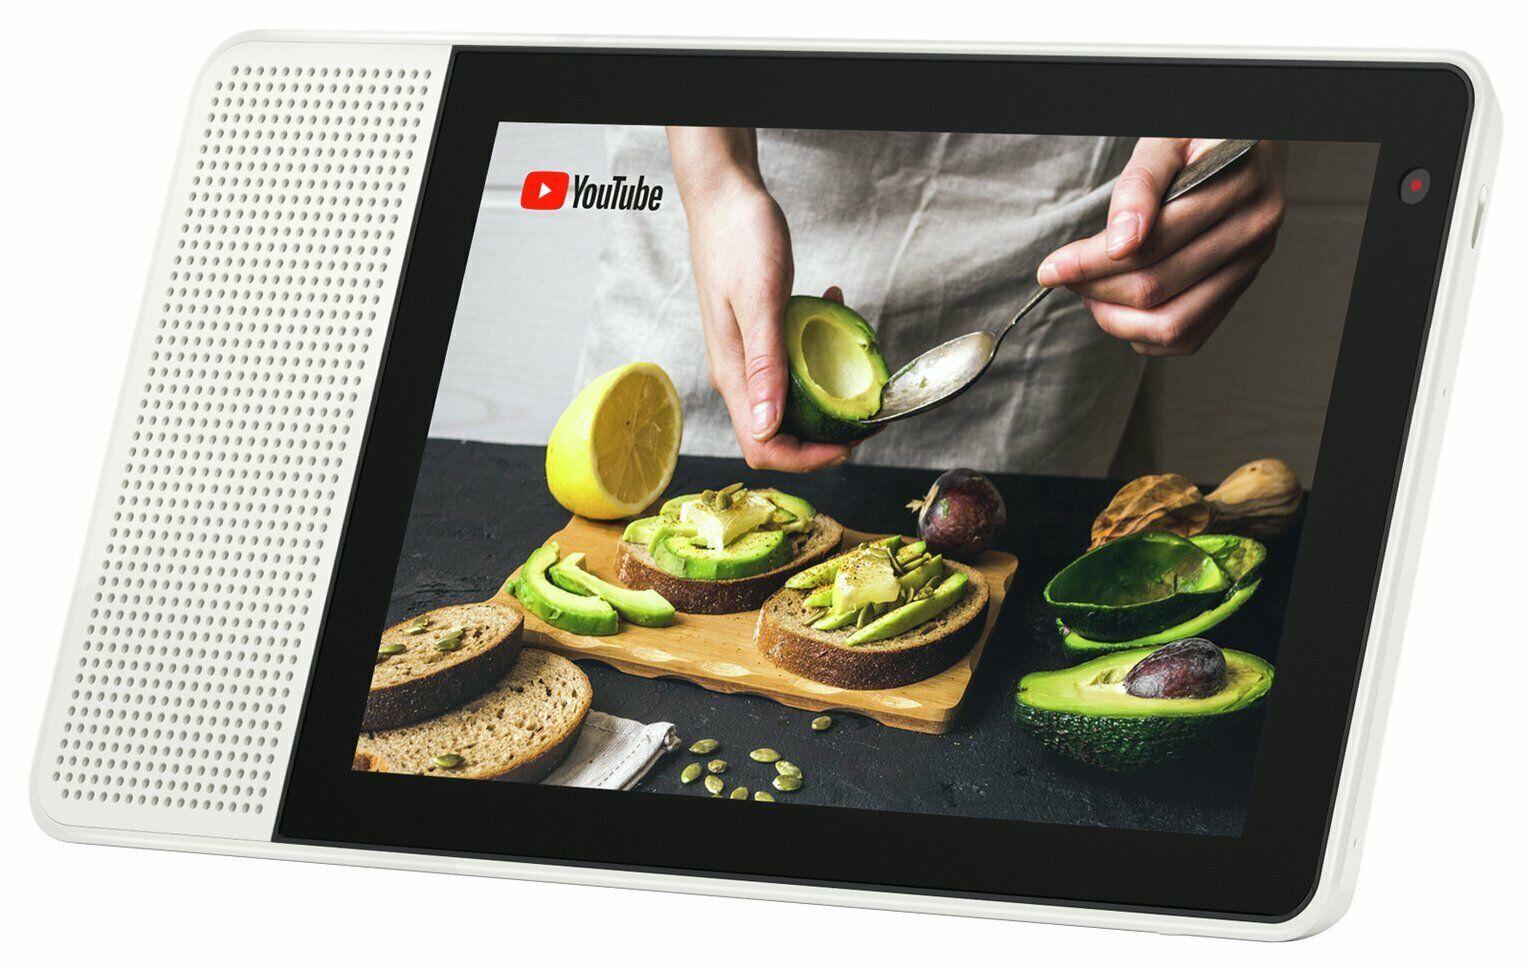 Lenovo Smart 8 Inch Display with Google Assistant £57.99 delivered @ Argos eBay